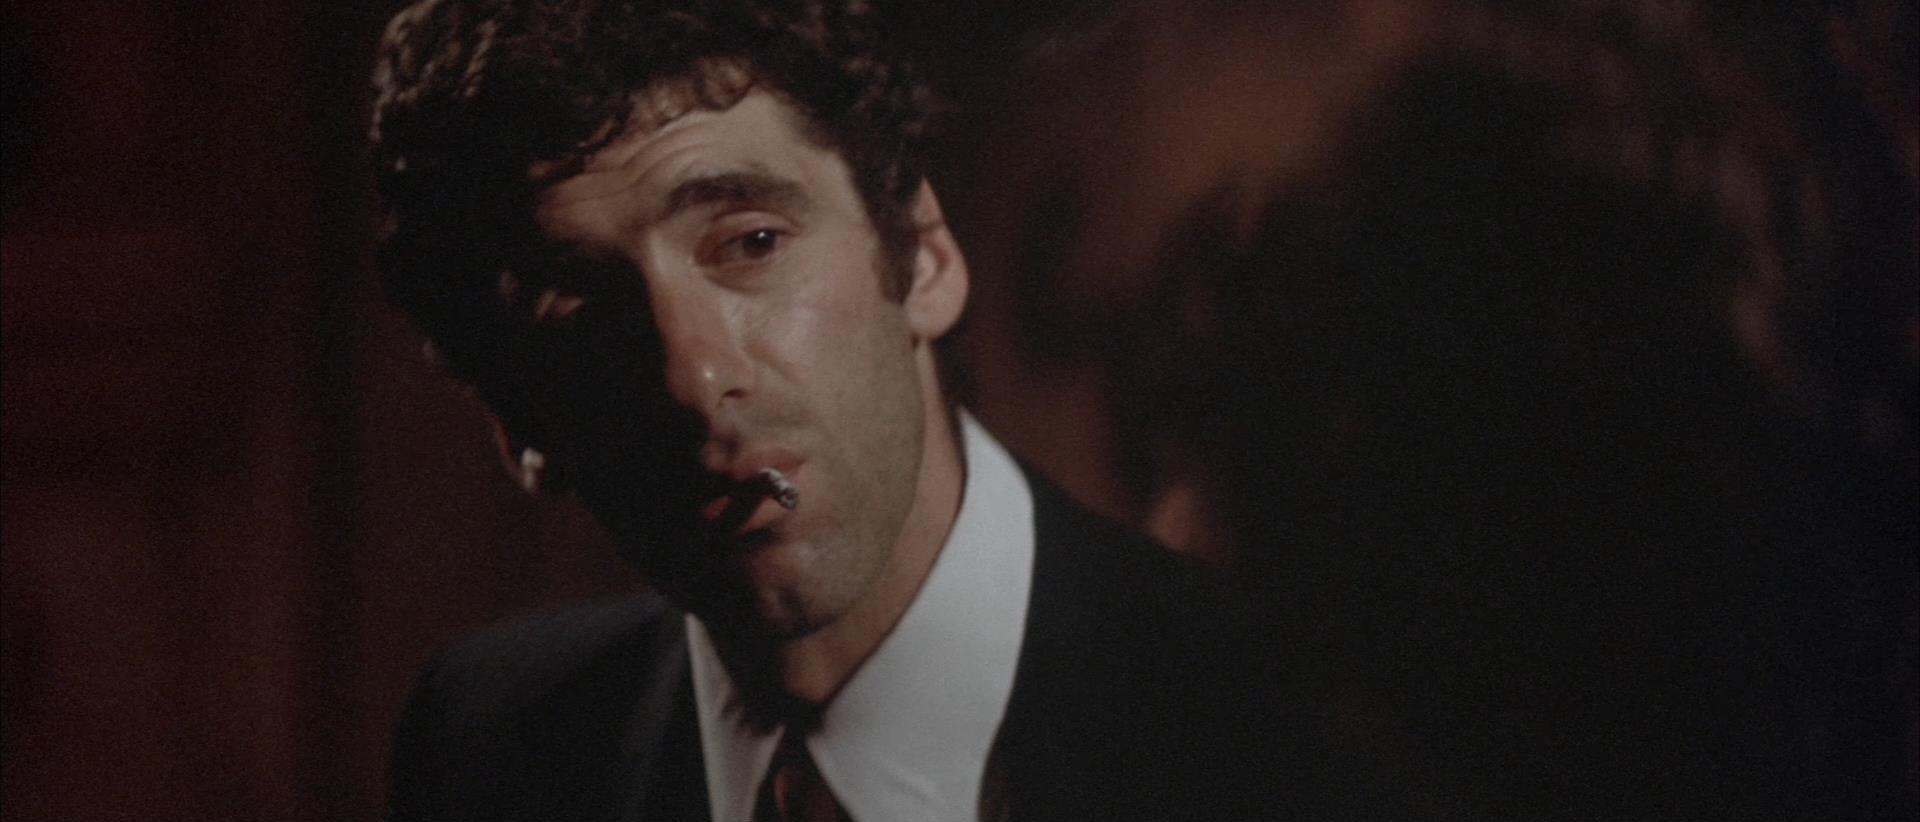 the long goodbye summary The long goodbye (1973) on imdb: plot summary, synopsis, and more.